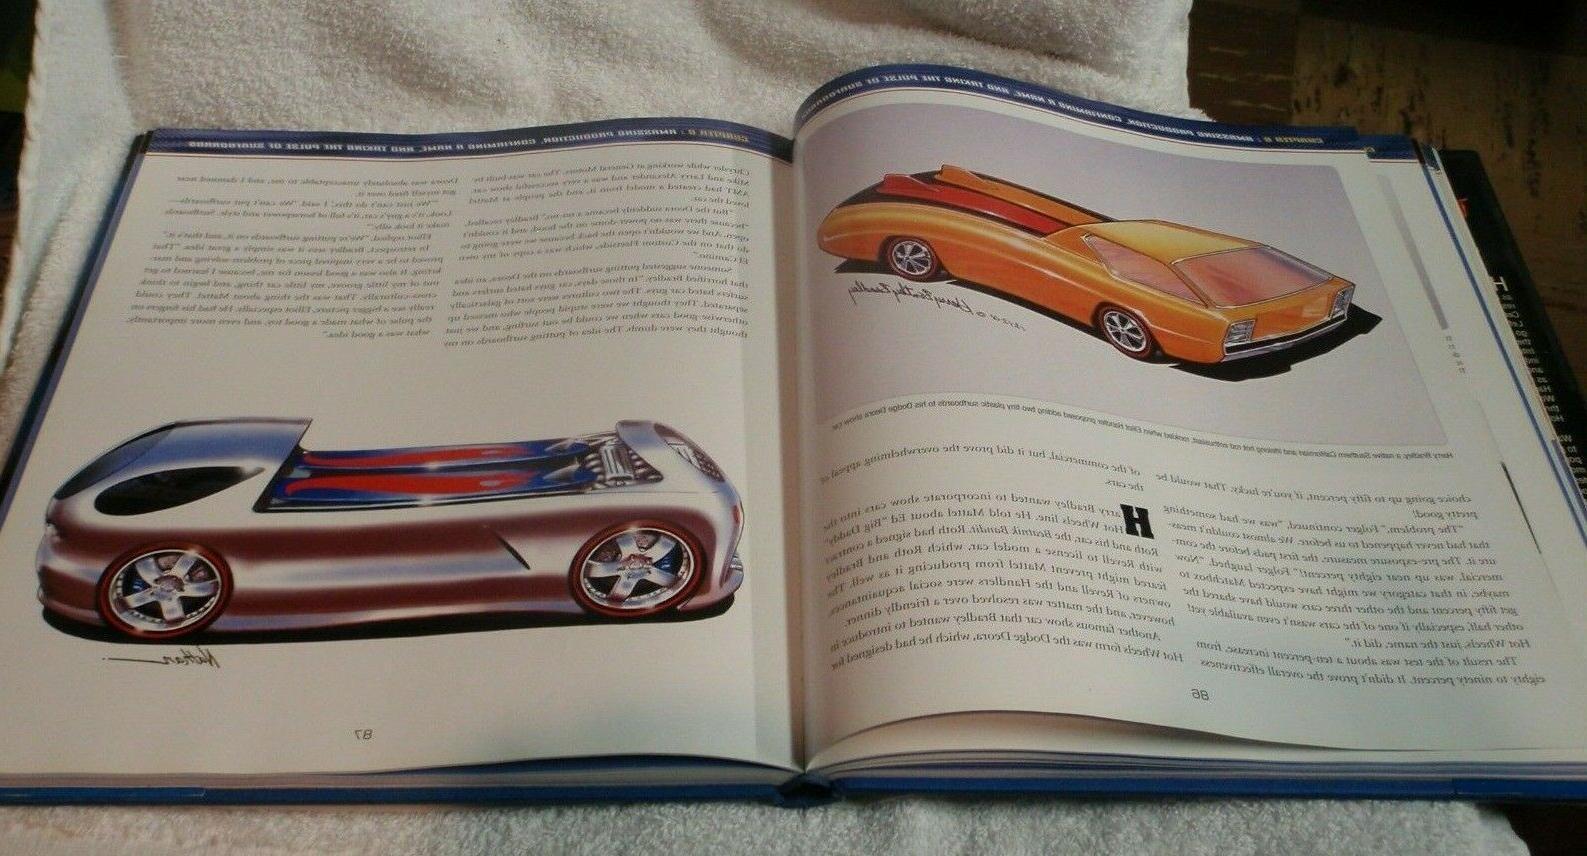 Hard Book Wheels Speed, Performance Attitude